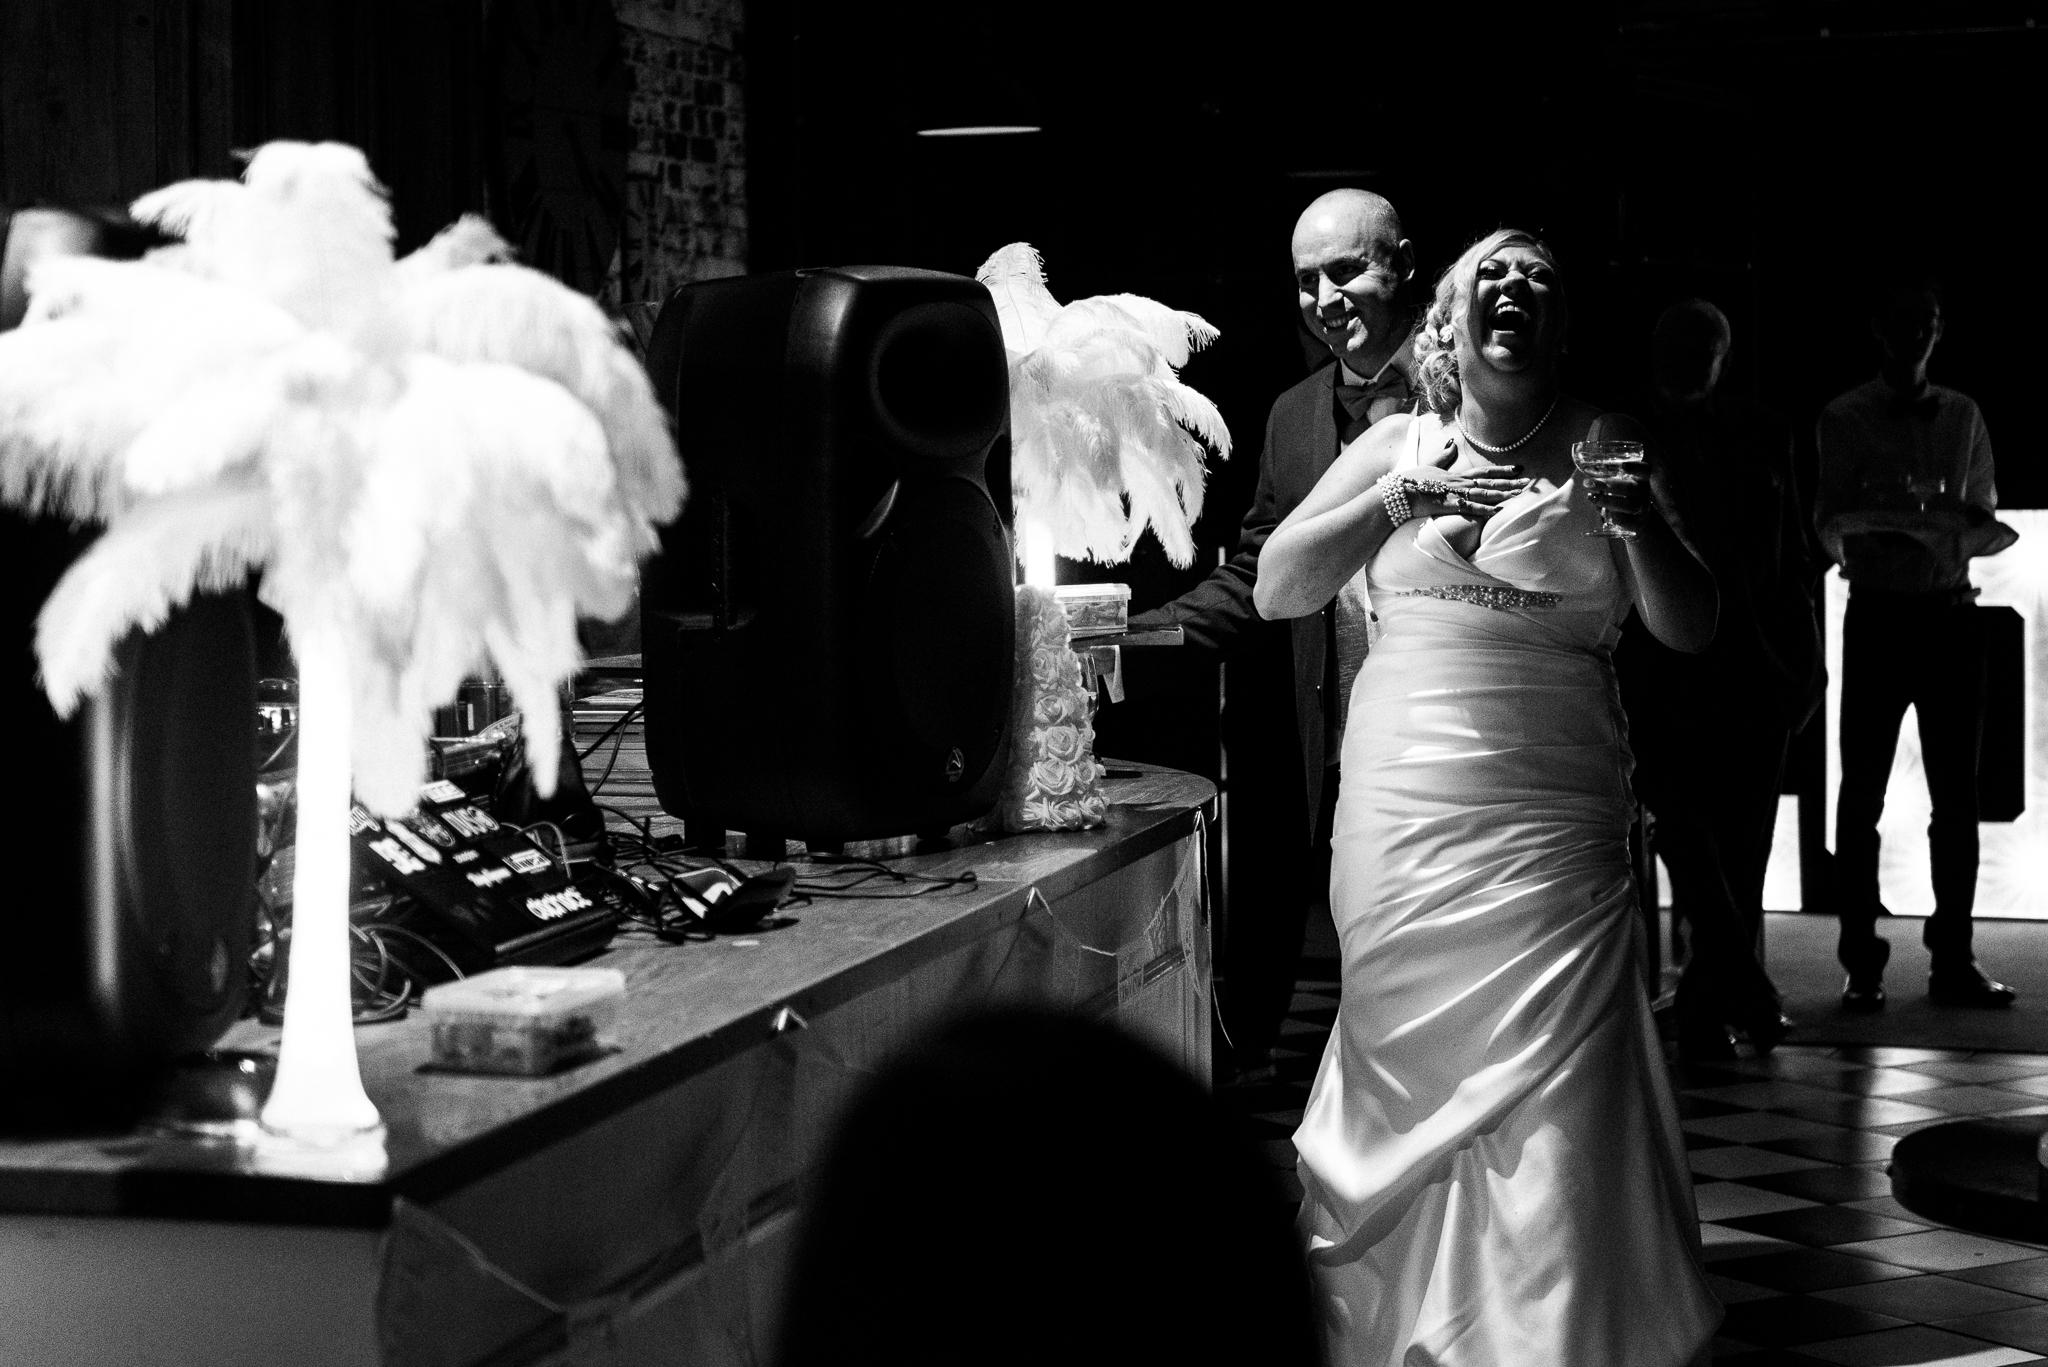 Manchester Wedding Photography On the 7th Media City UK, Salford 20s Art Deco Feathers Urban - Jenny Harper-30.jpg